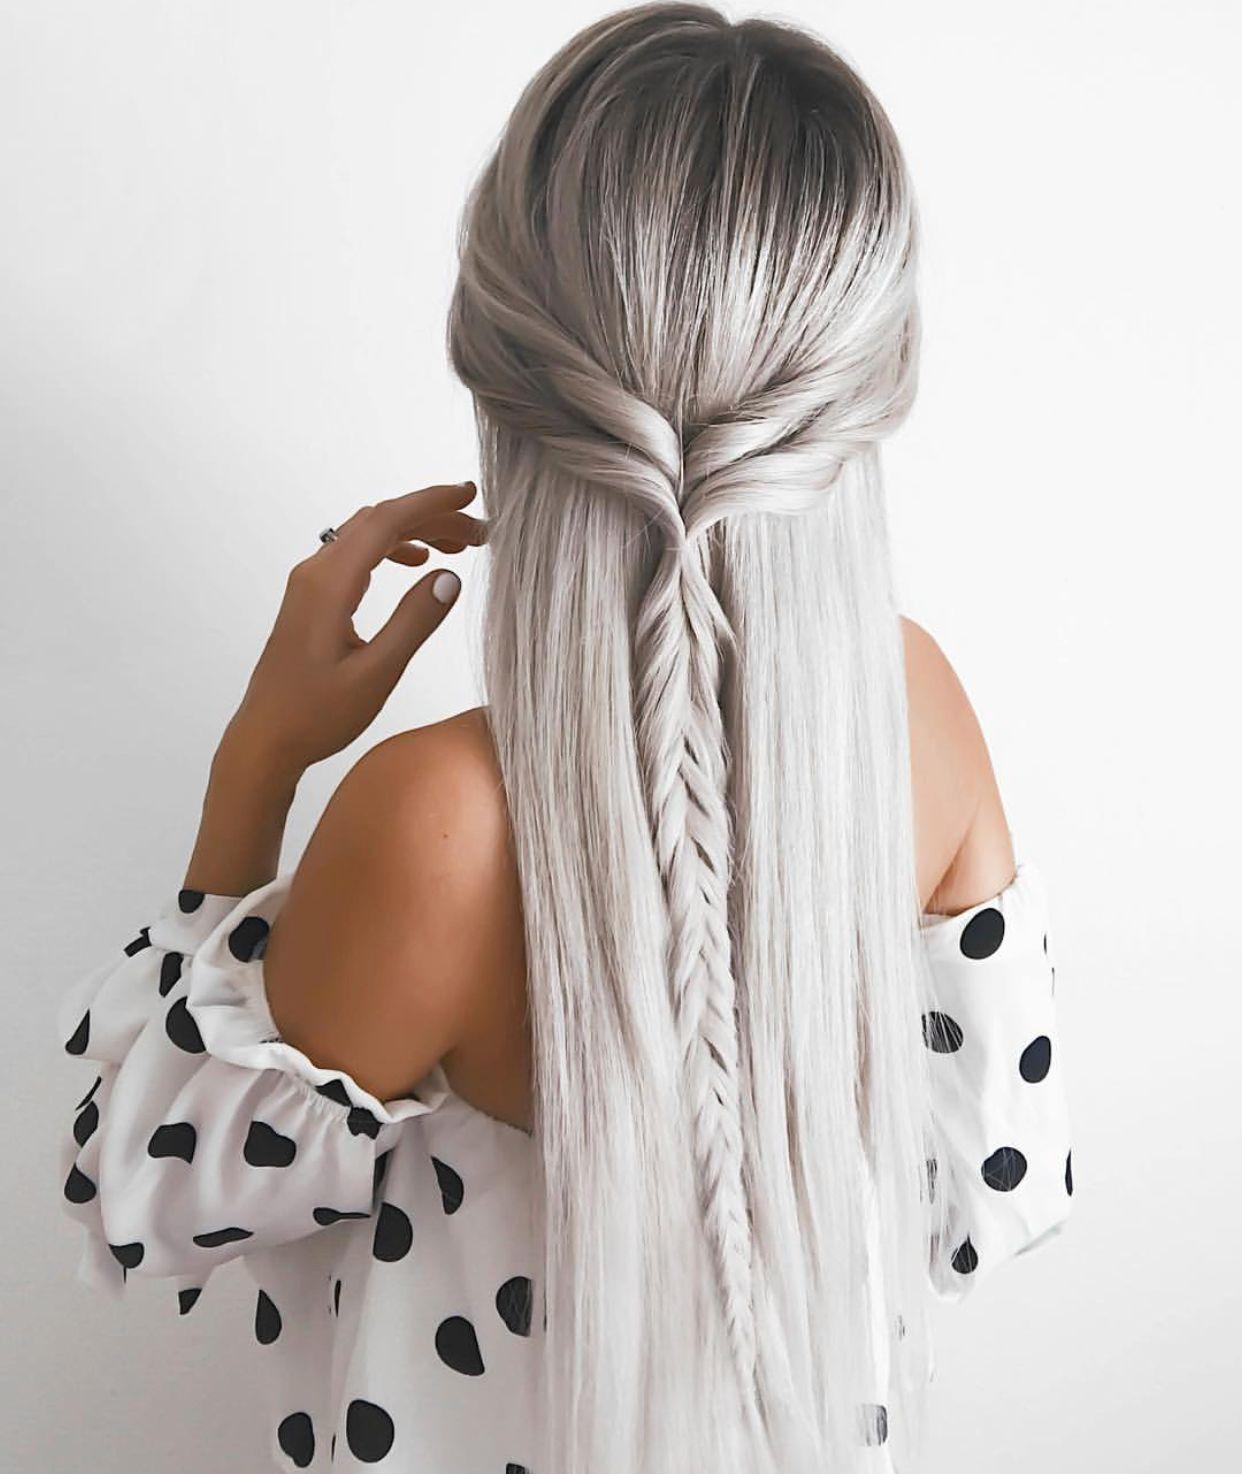 Pinterest kat g hair pinterest hair style hair goals and